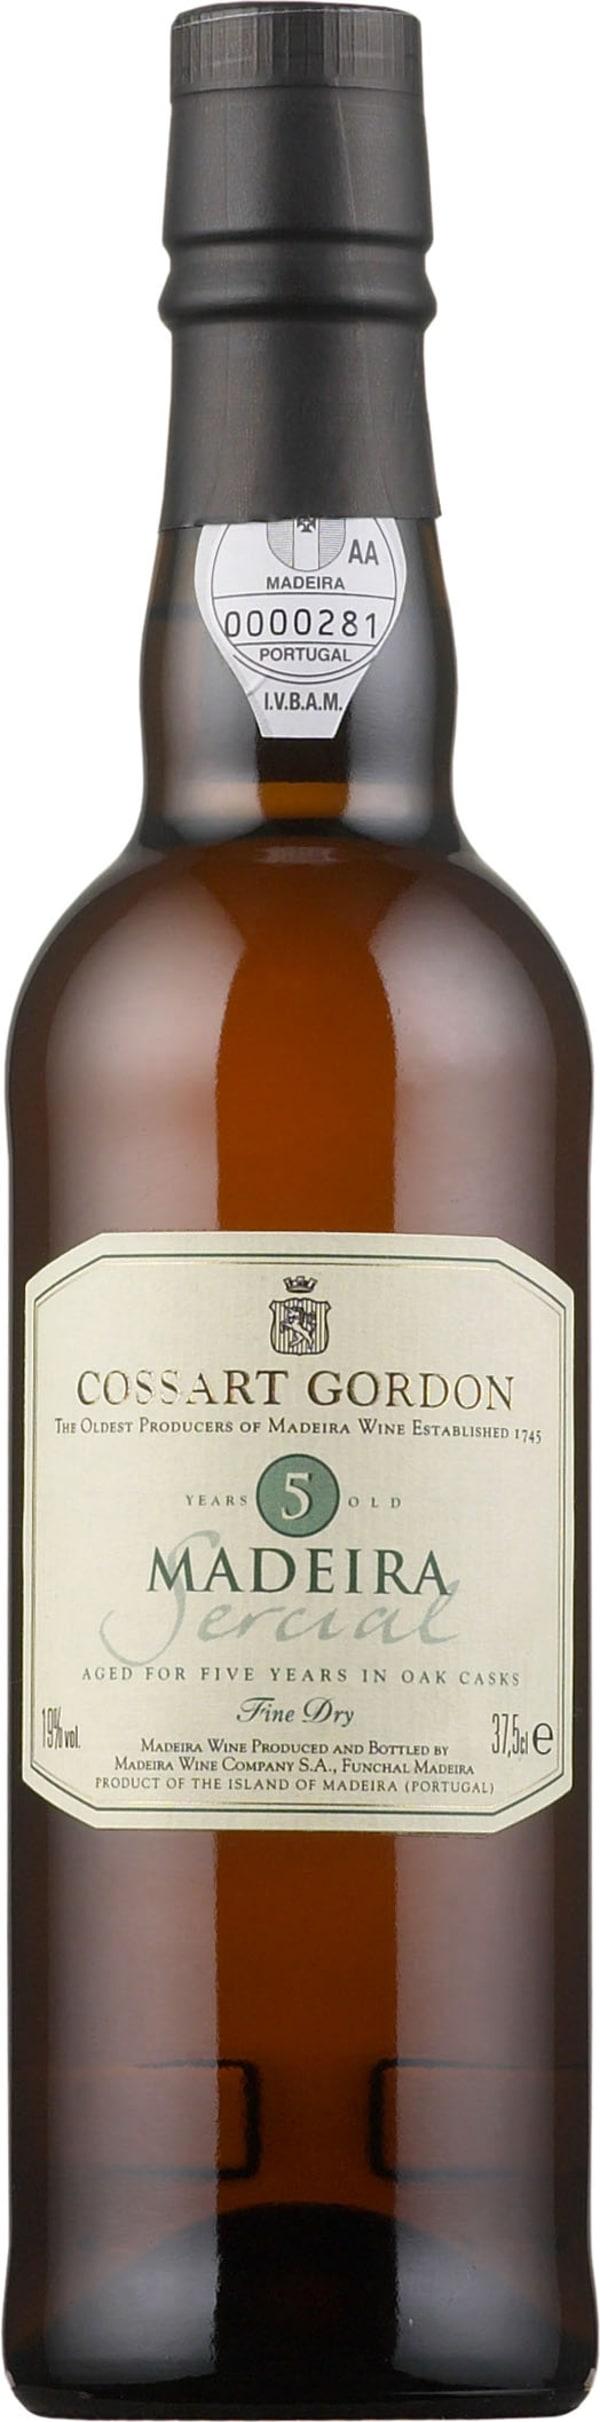 Cossart Gordon 5 Year Old Sercial Madeira